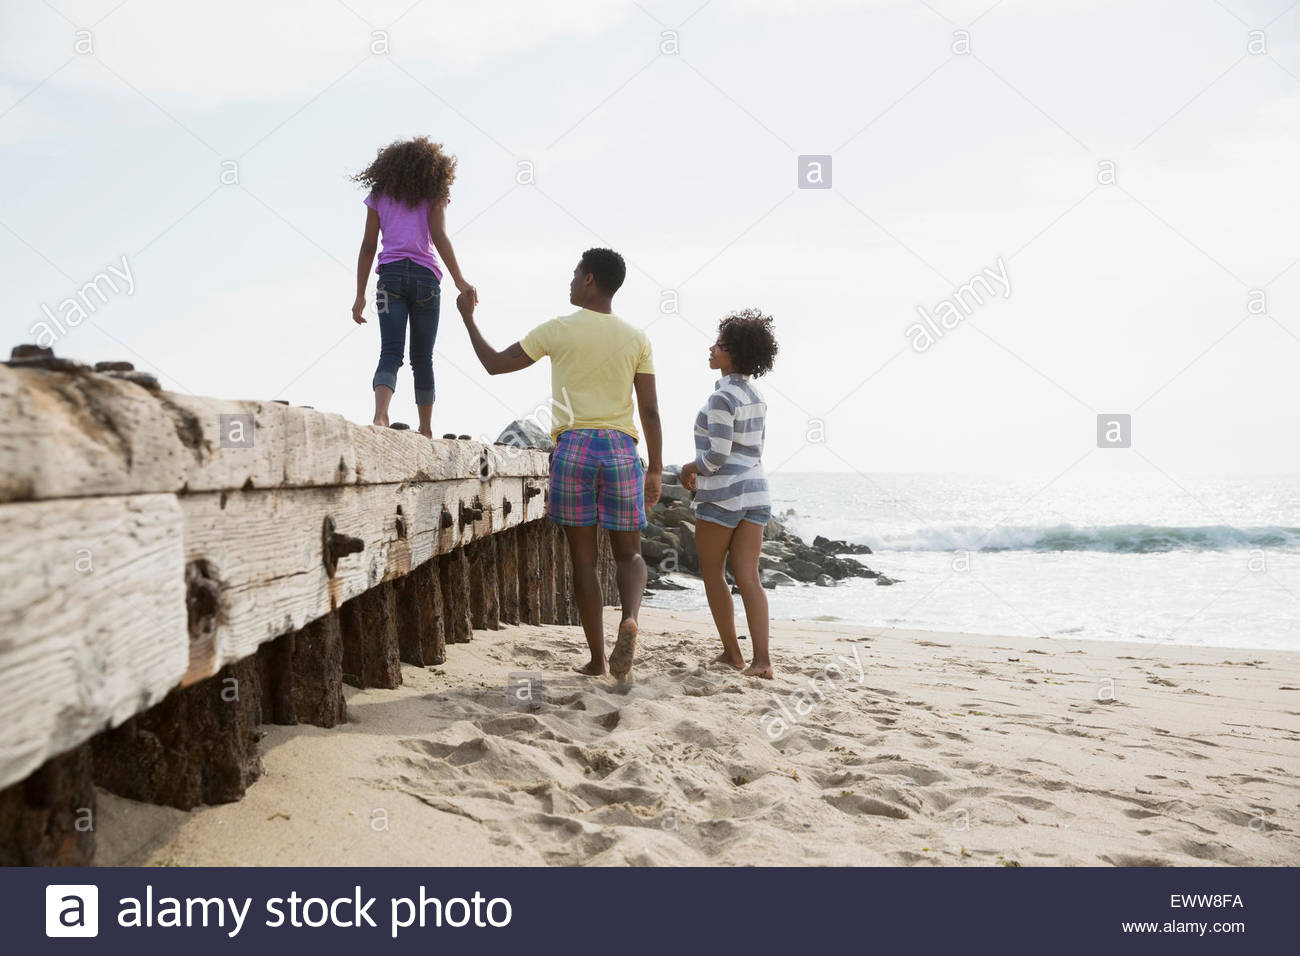 Family walking along beach wall - Stock Image